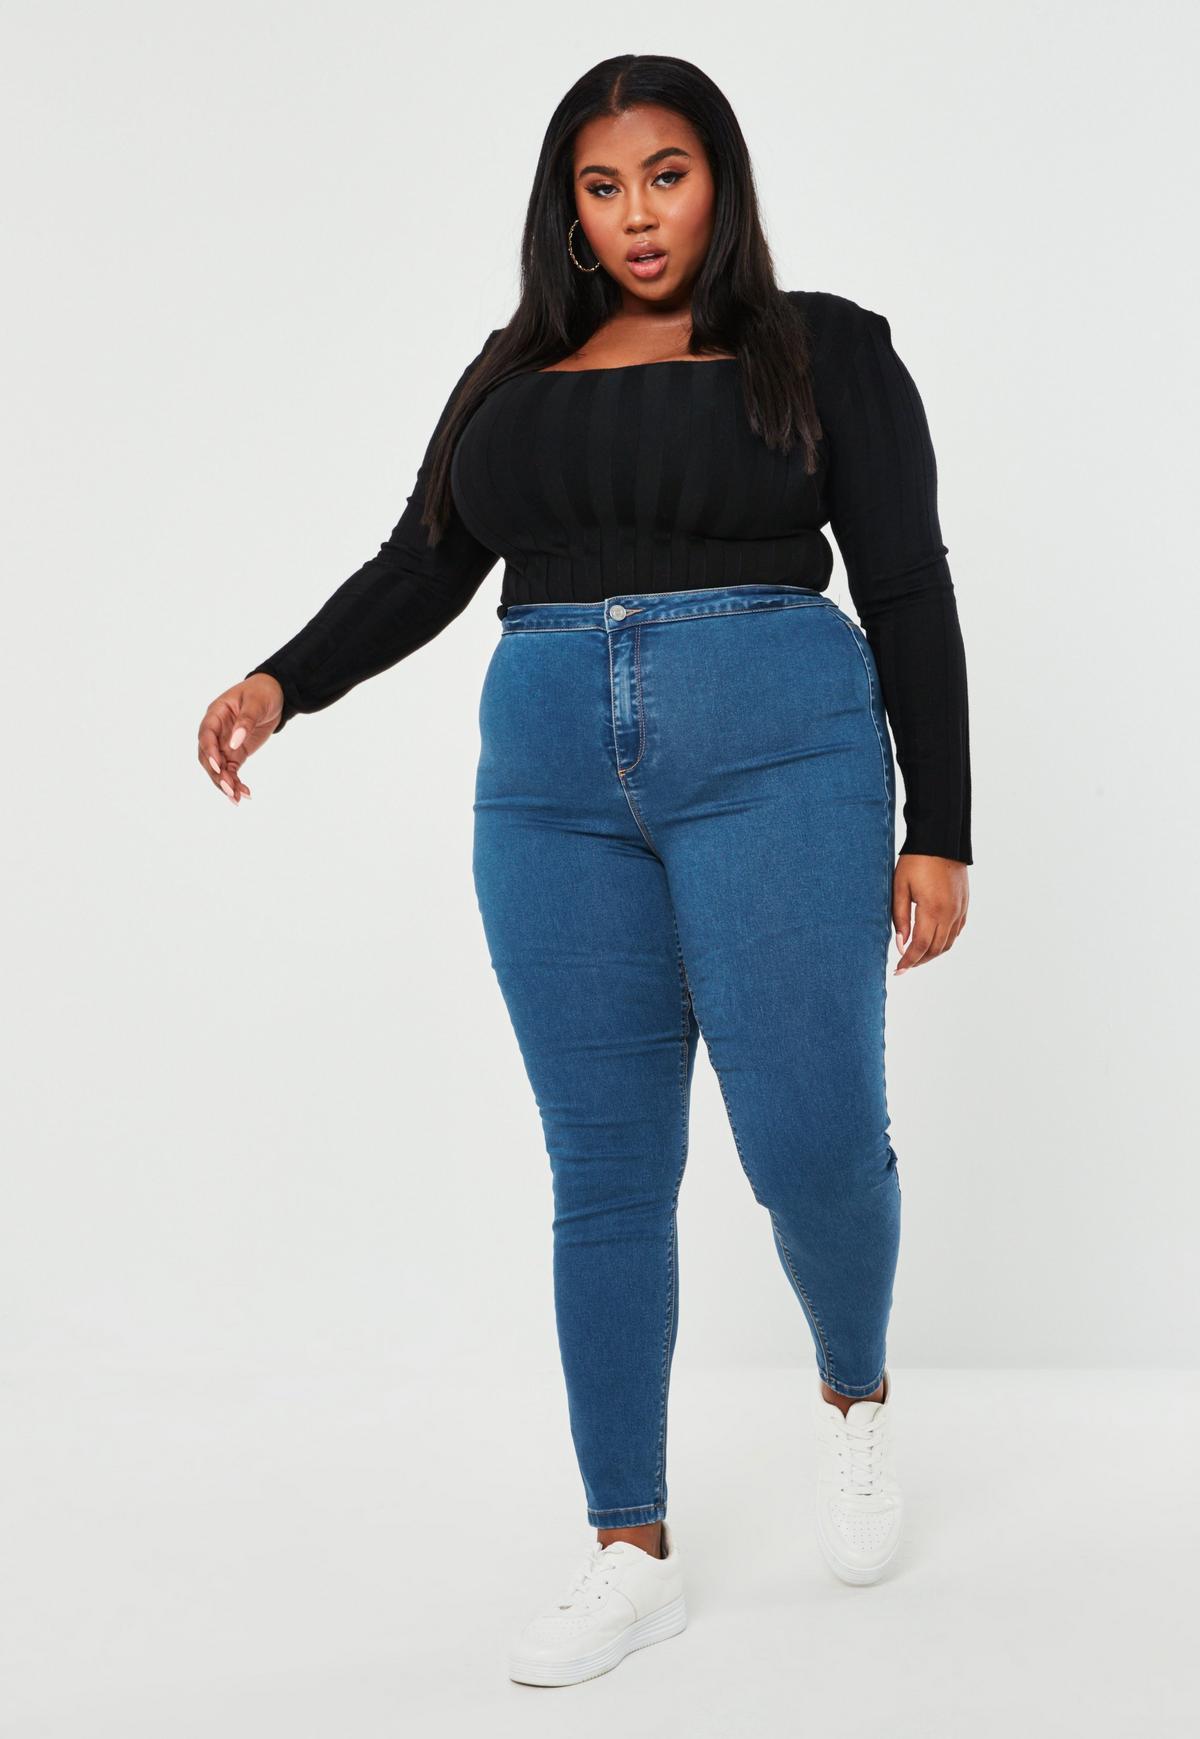 New Fashion Spring Autumn Women Jeans Plus Size Stretch